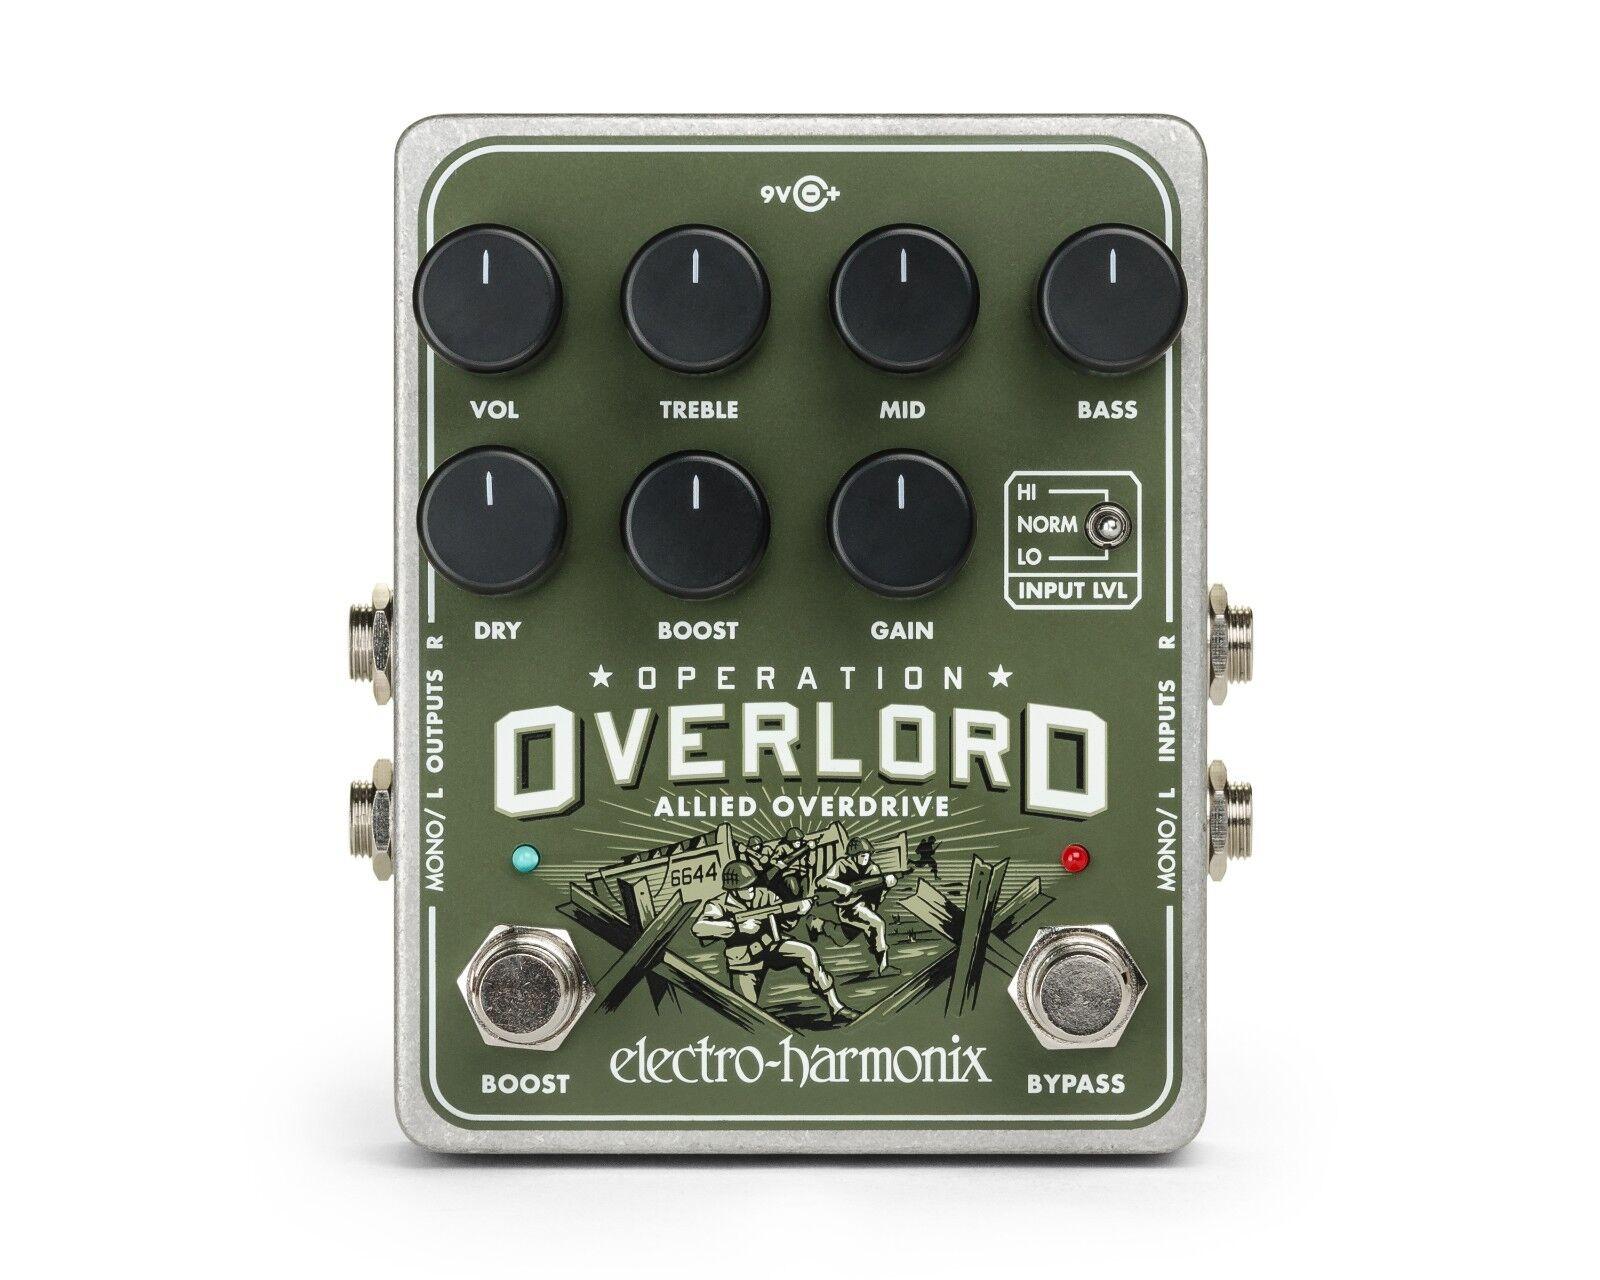 Electro Harmonix Ehx Betrieb Overlord, Neu in Box